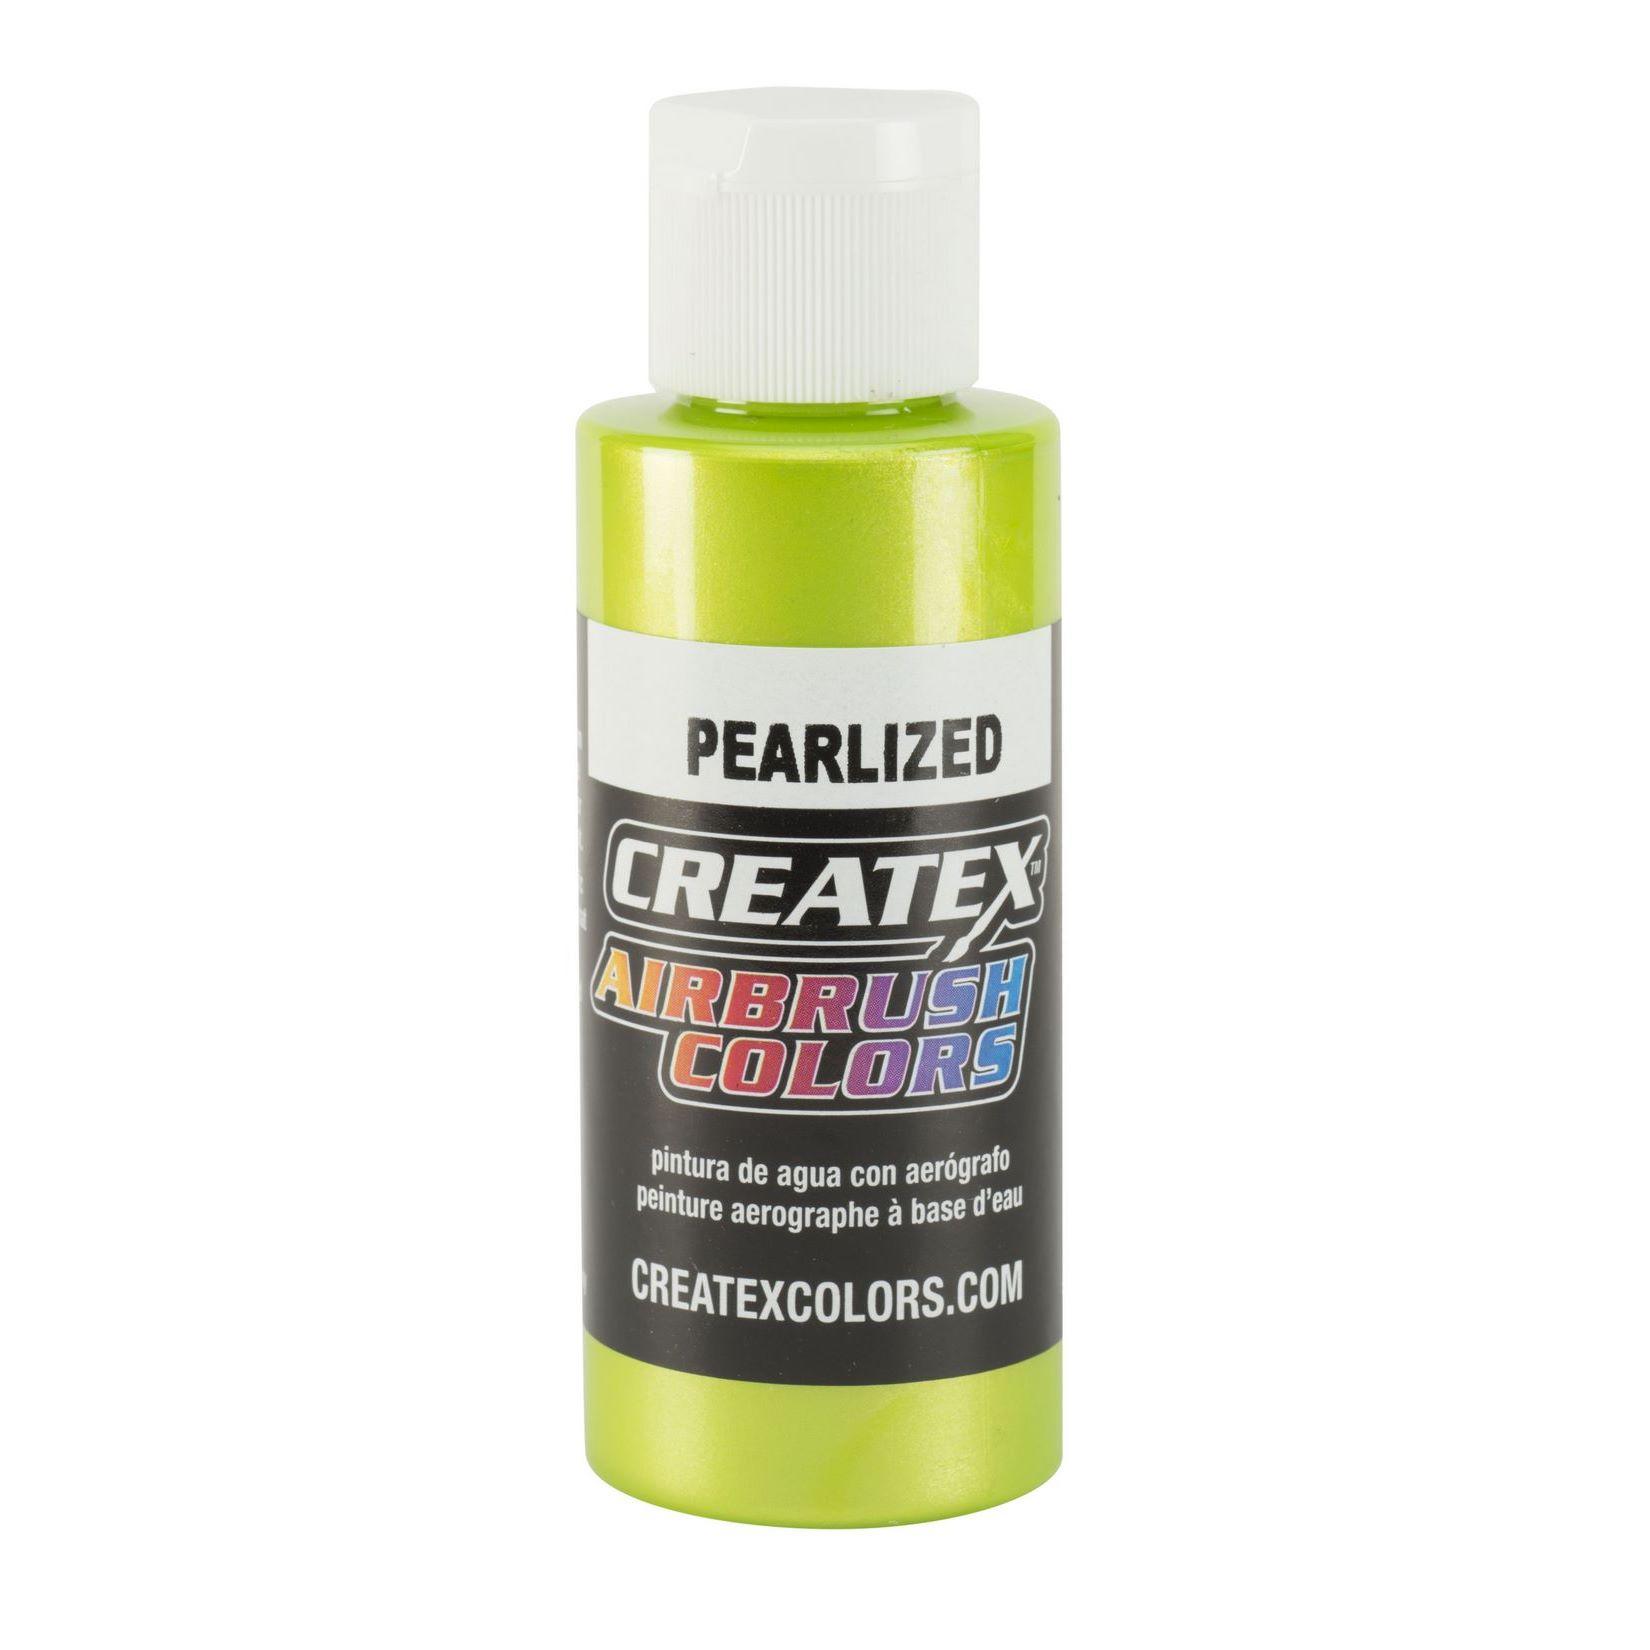 pearl lime Createx Airbrush Colors Farbe 60ml 11 5313 Createx